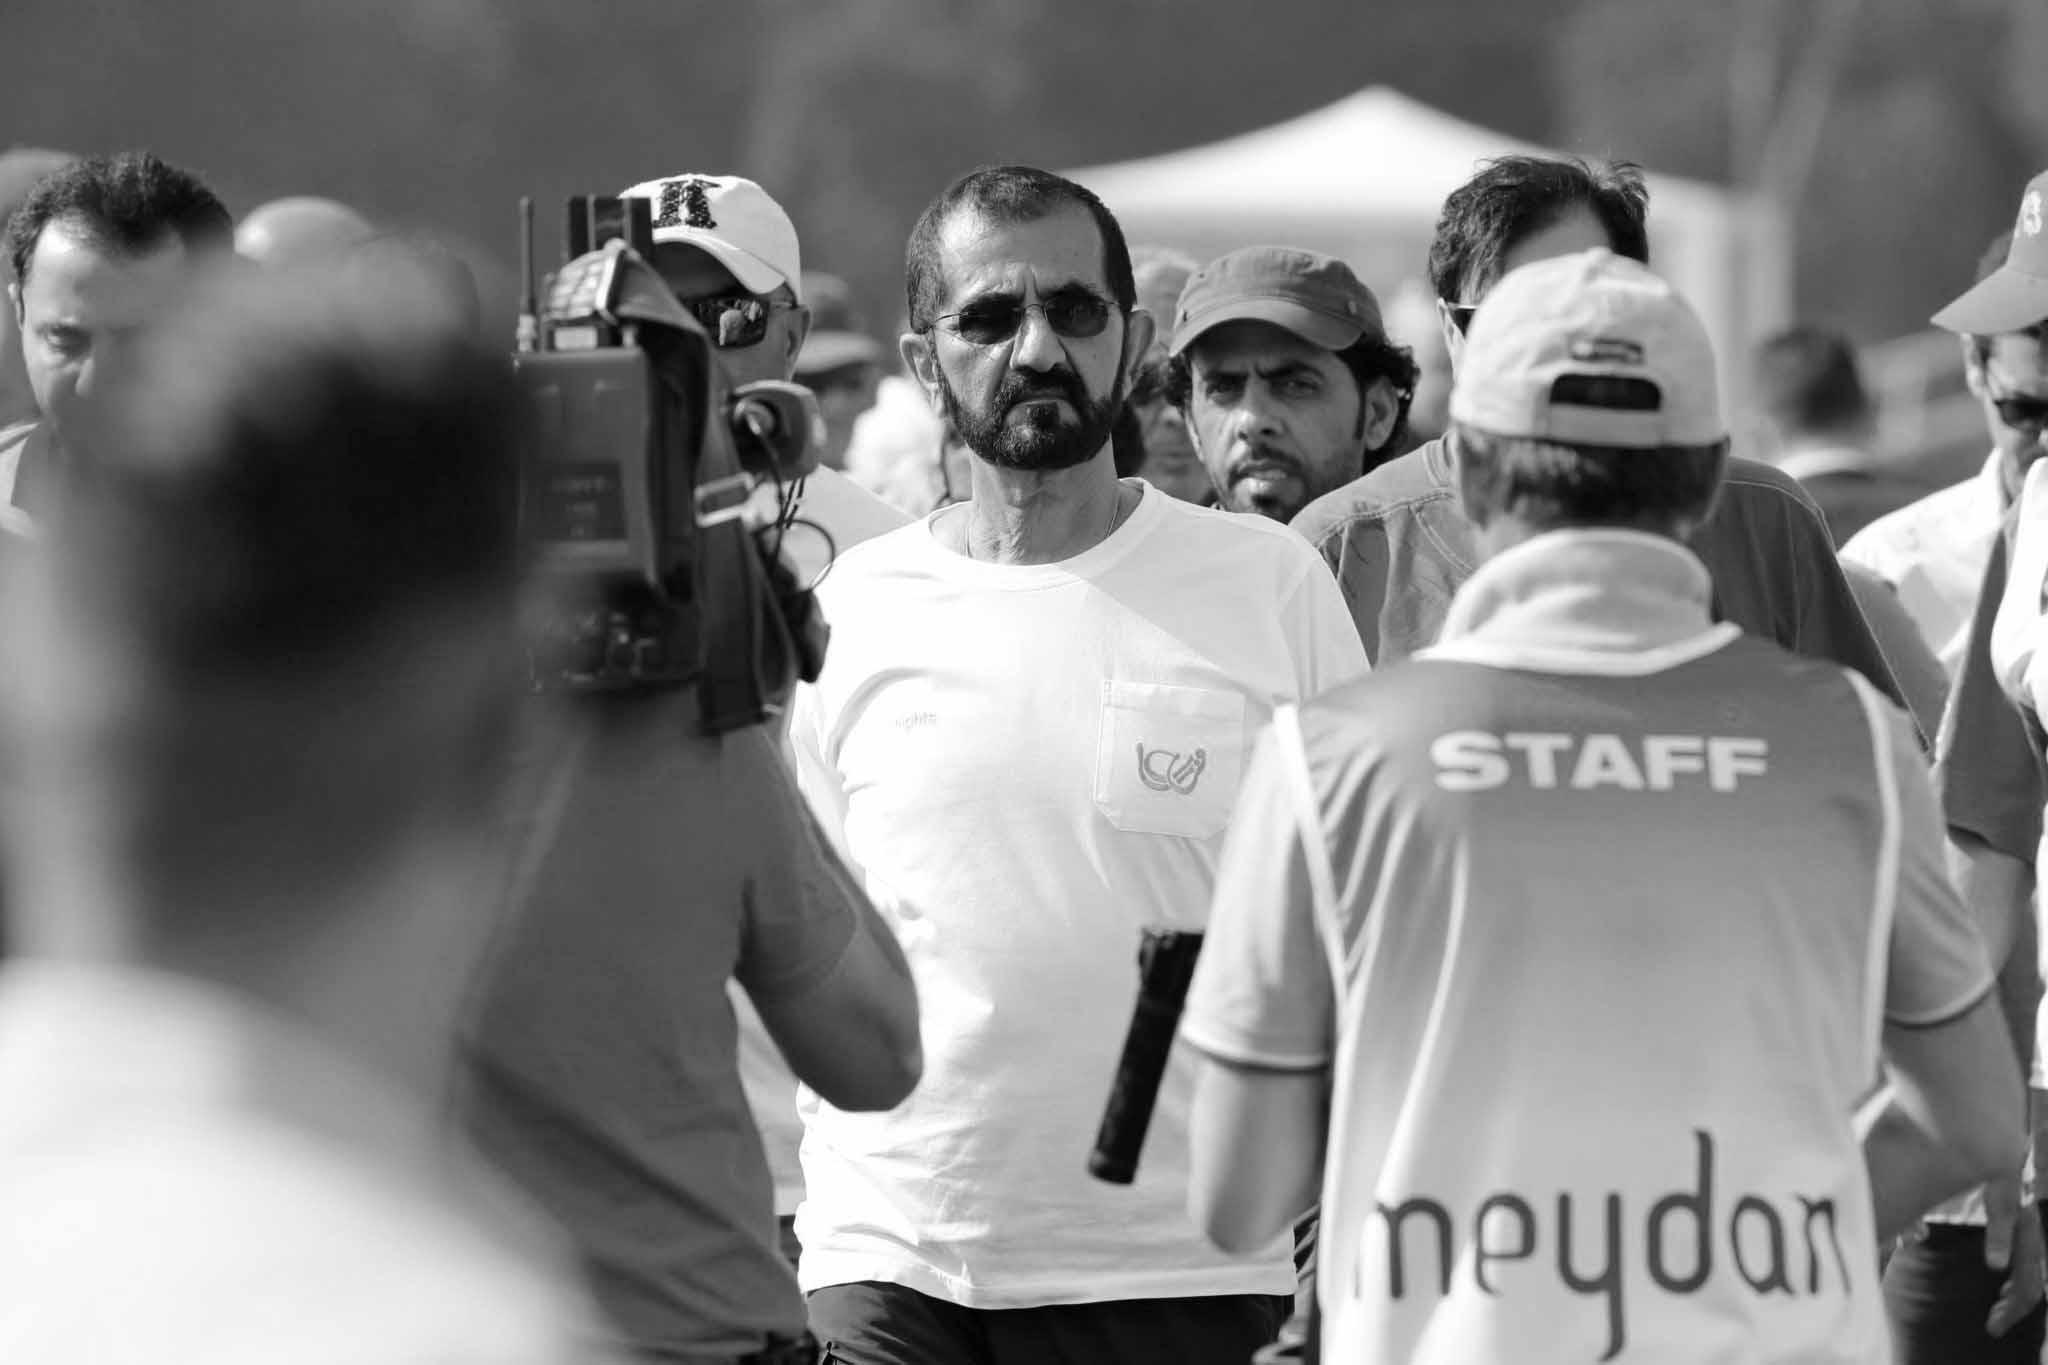 HH Sheikh Mohammed bin Rashid Al Maktoum arrives at San Rossore racecourse - Endurance Lifestyle 2016 - Pisa - San Rossore,23rd july 2016ph.Stefano Grasso/Endurance Lifestyle 2016